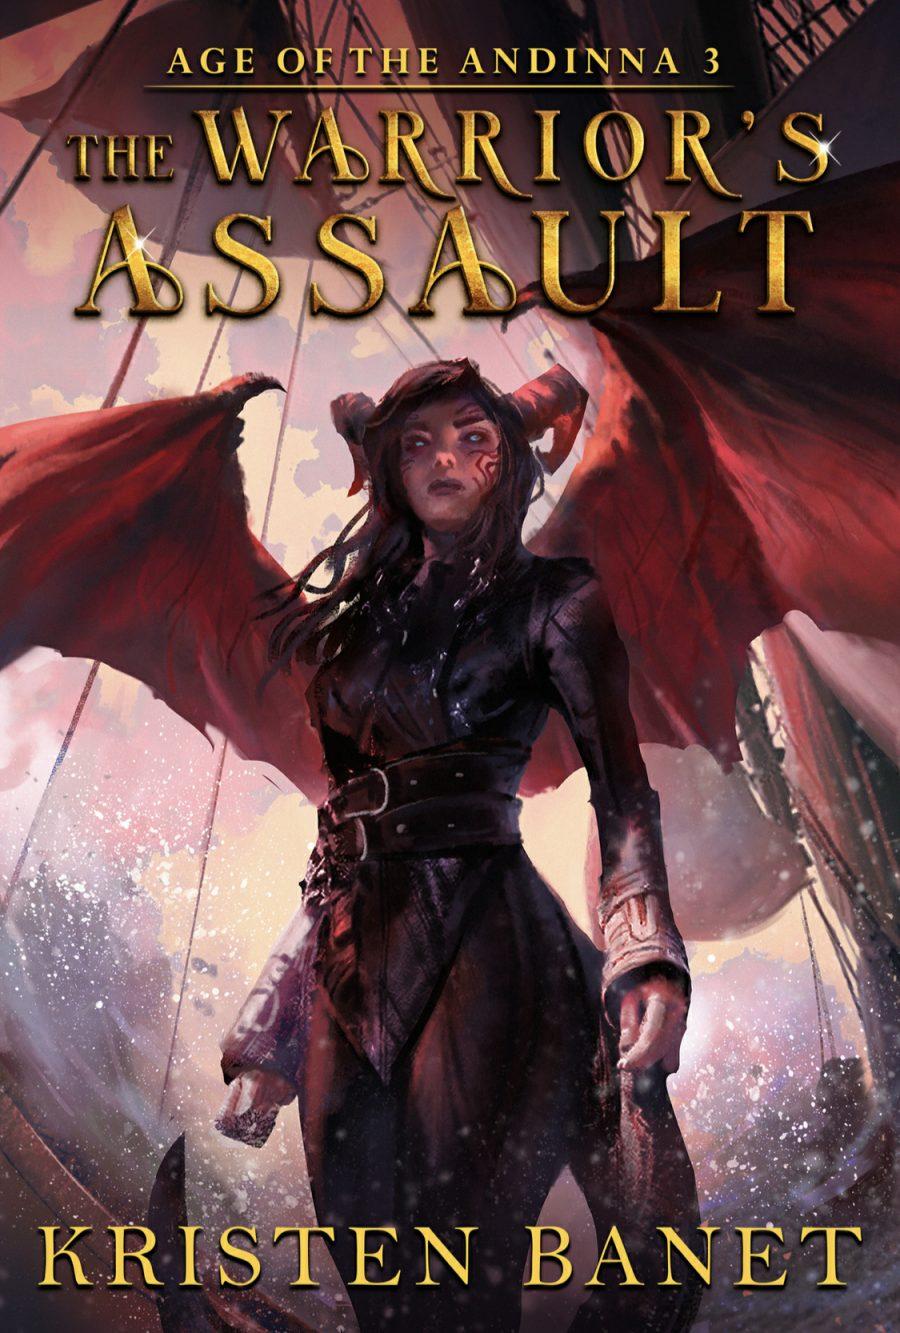 The Warrior's Assault by Kristen Banet - A Book Review #BookReview #EpicFantasy #SlowBurn #RH #5Stars #MustRead #Book3 #KindleUnlimited #KU